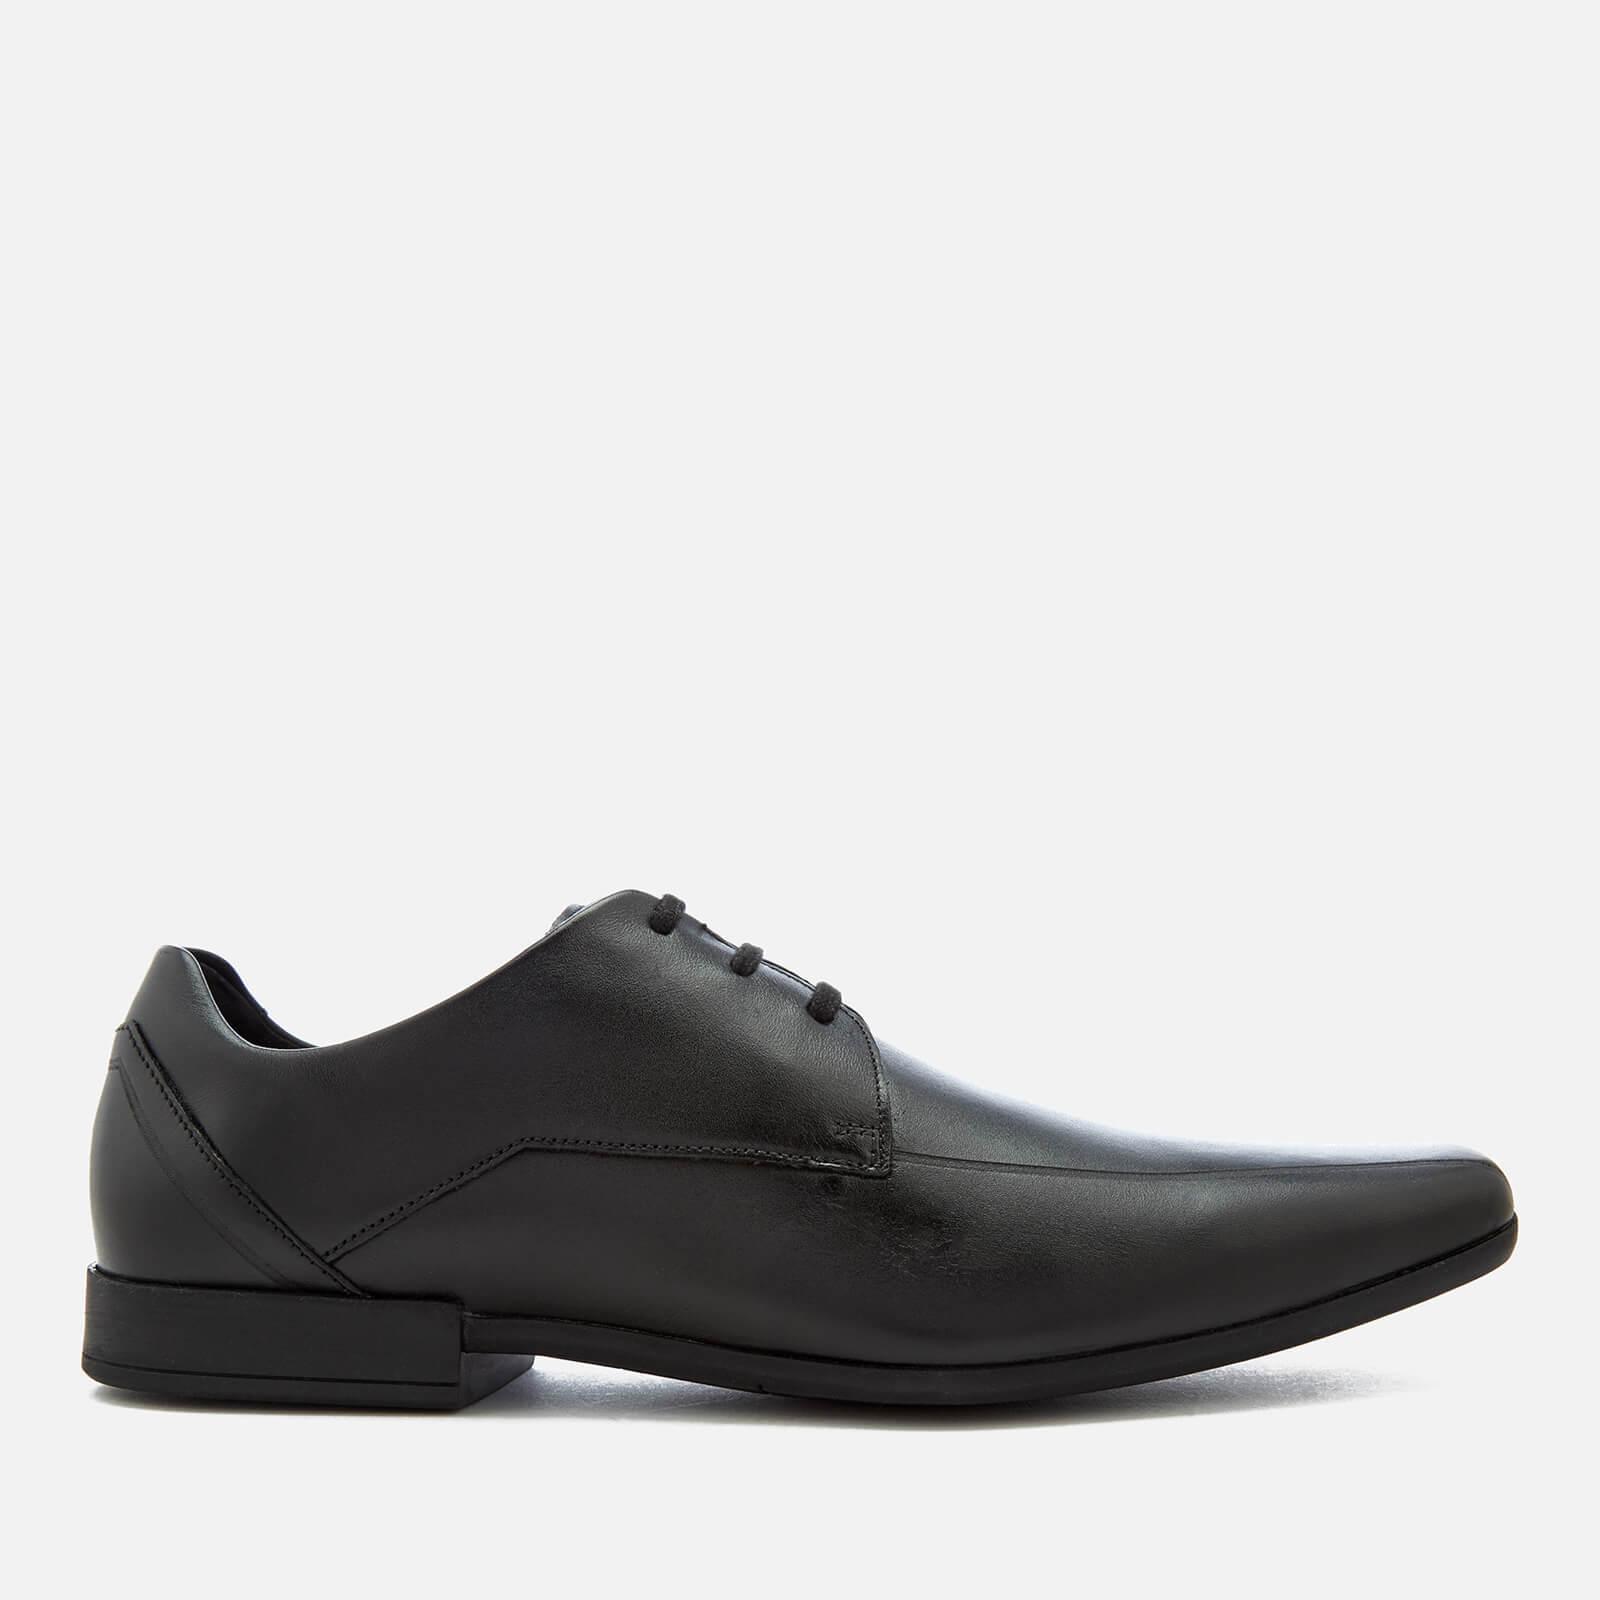 Clarks Men's Glement Over Leather Derby Shoes - Black - UK 10